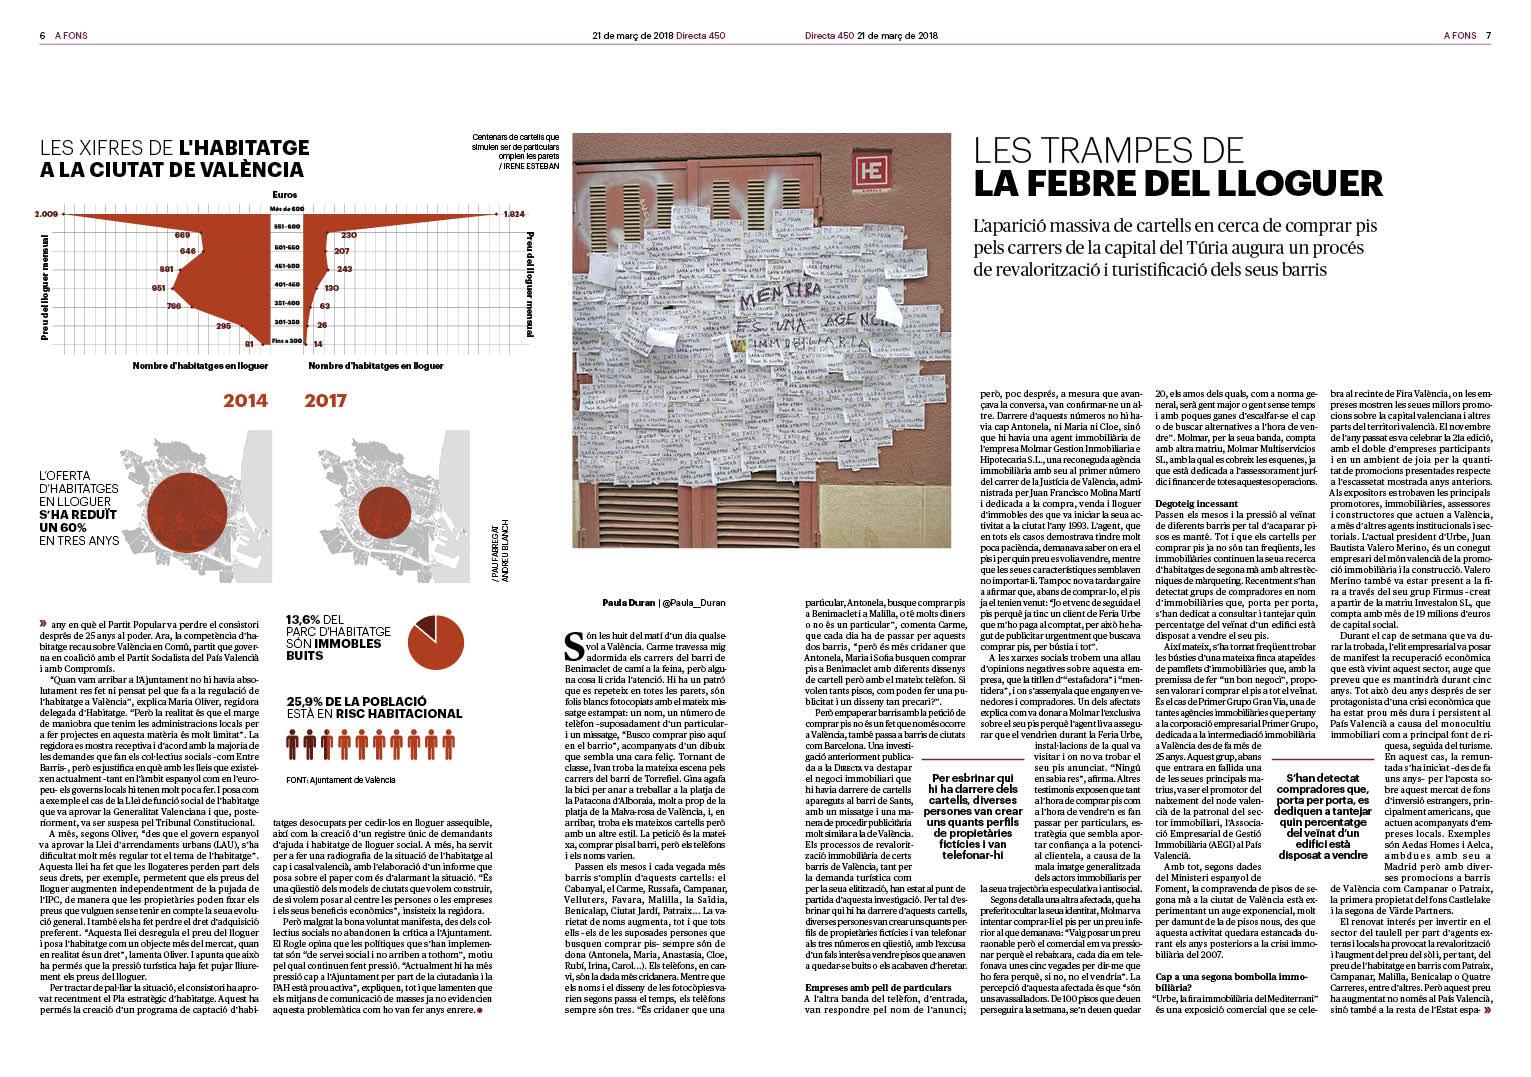 Especulació urbanística a València